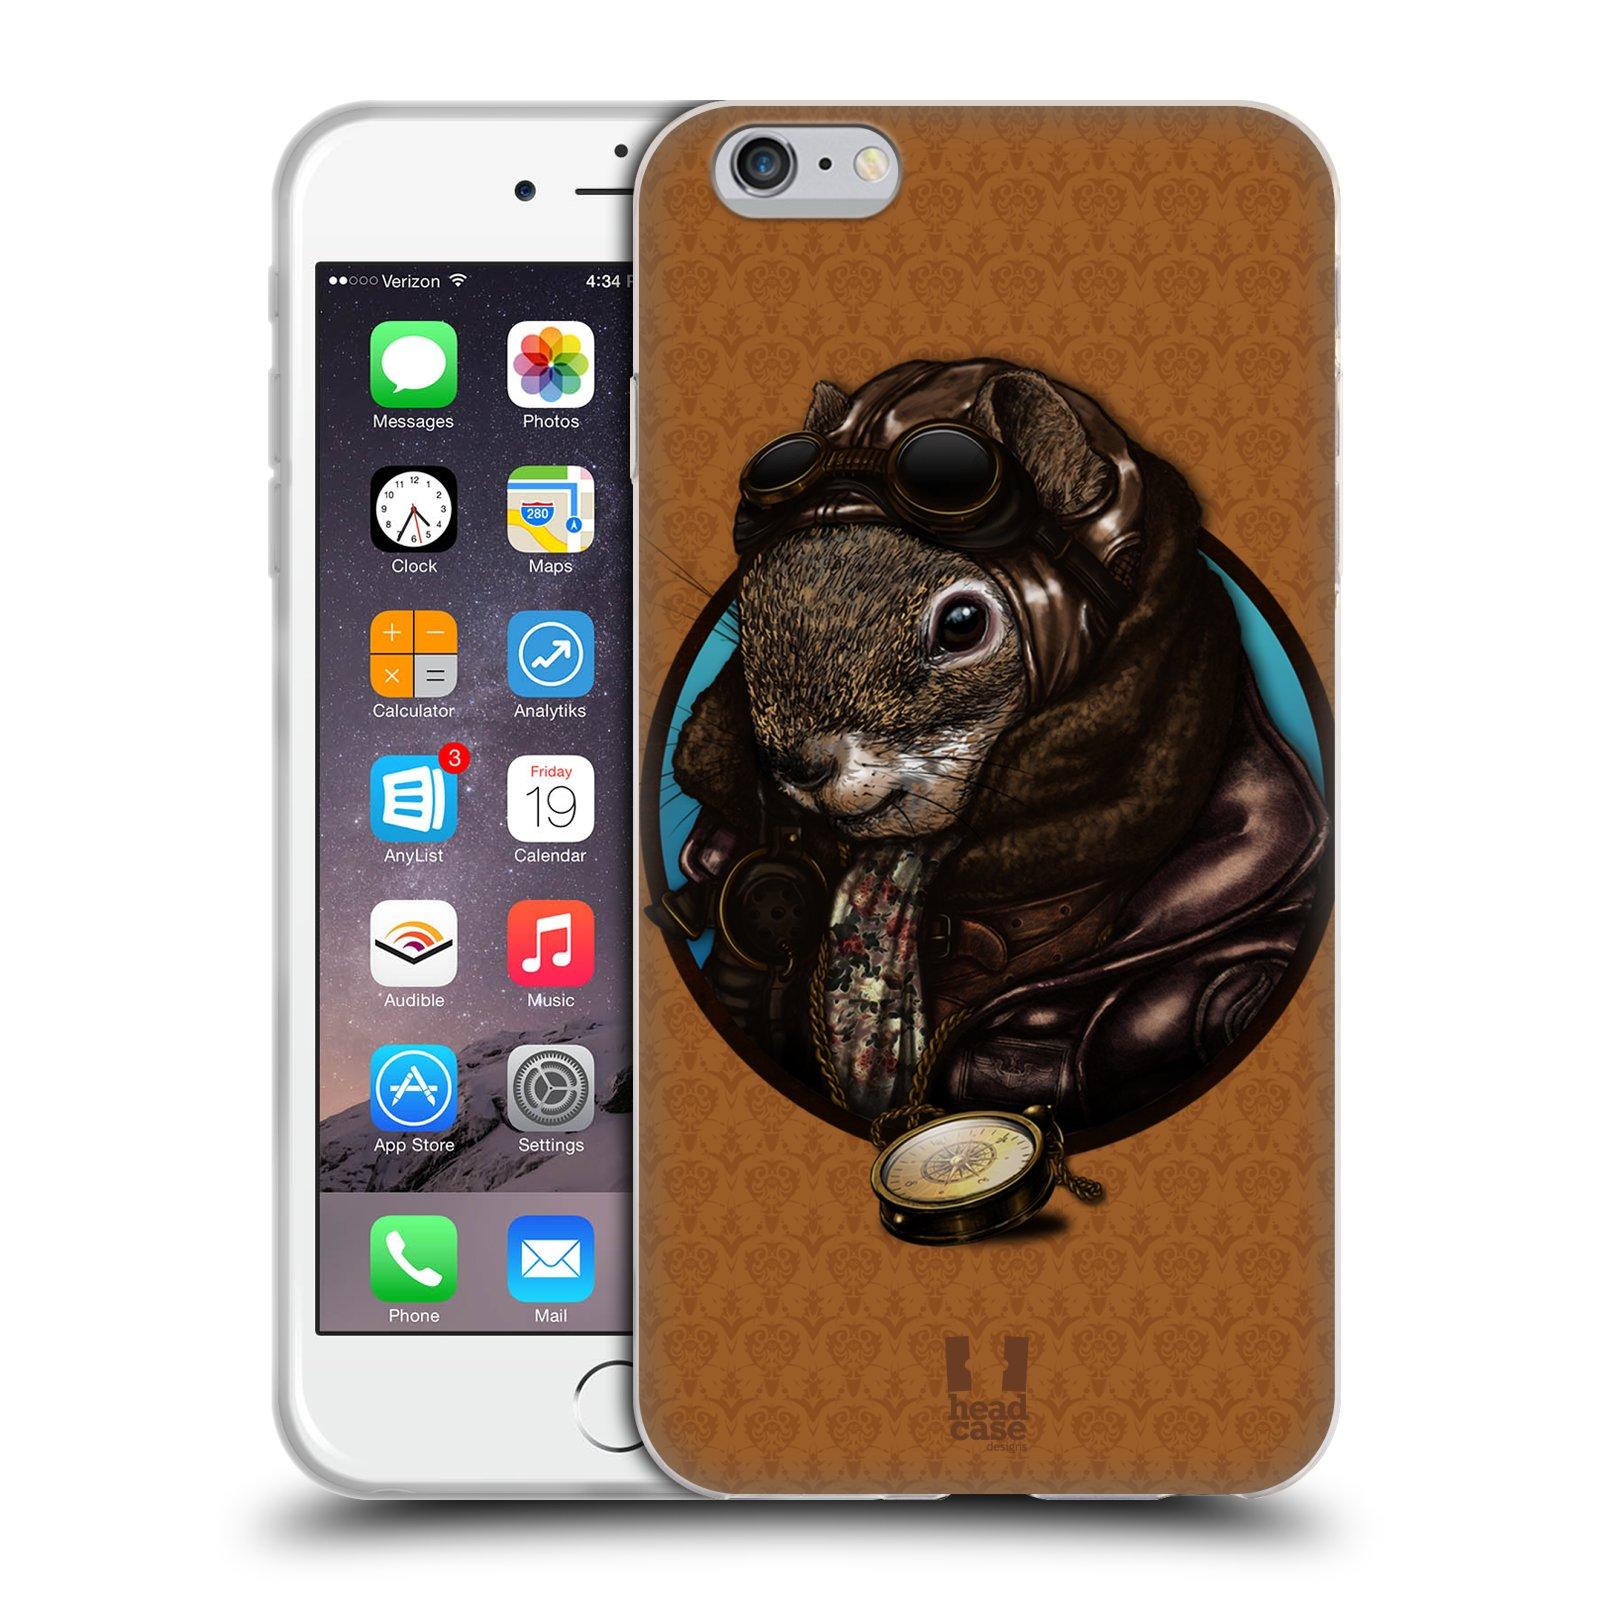 HEAD CASE silikonový obal na mobil Apple Iphone 6 PLUS/ 6S PLUS vzor módní zvířátka veverka